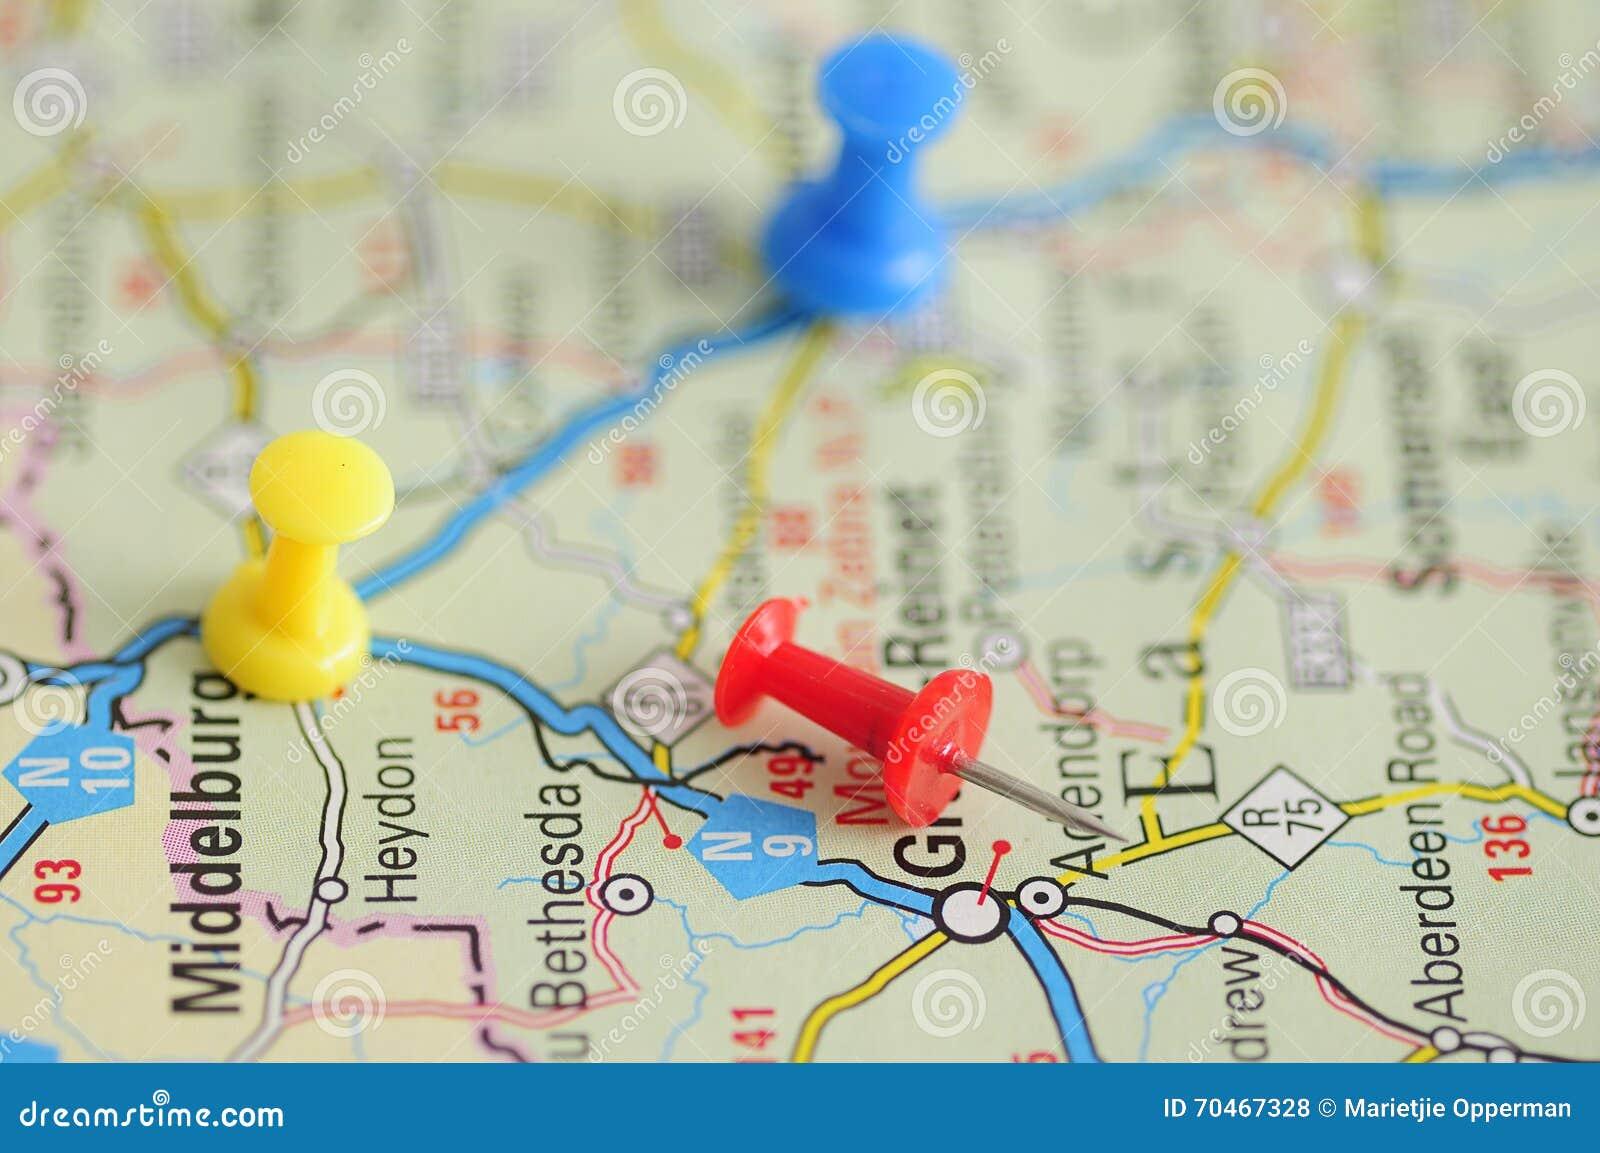 push pins on a map stock photo image of city pushpin 70467328